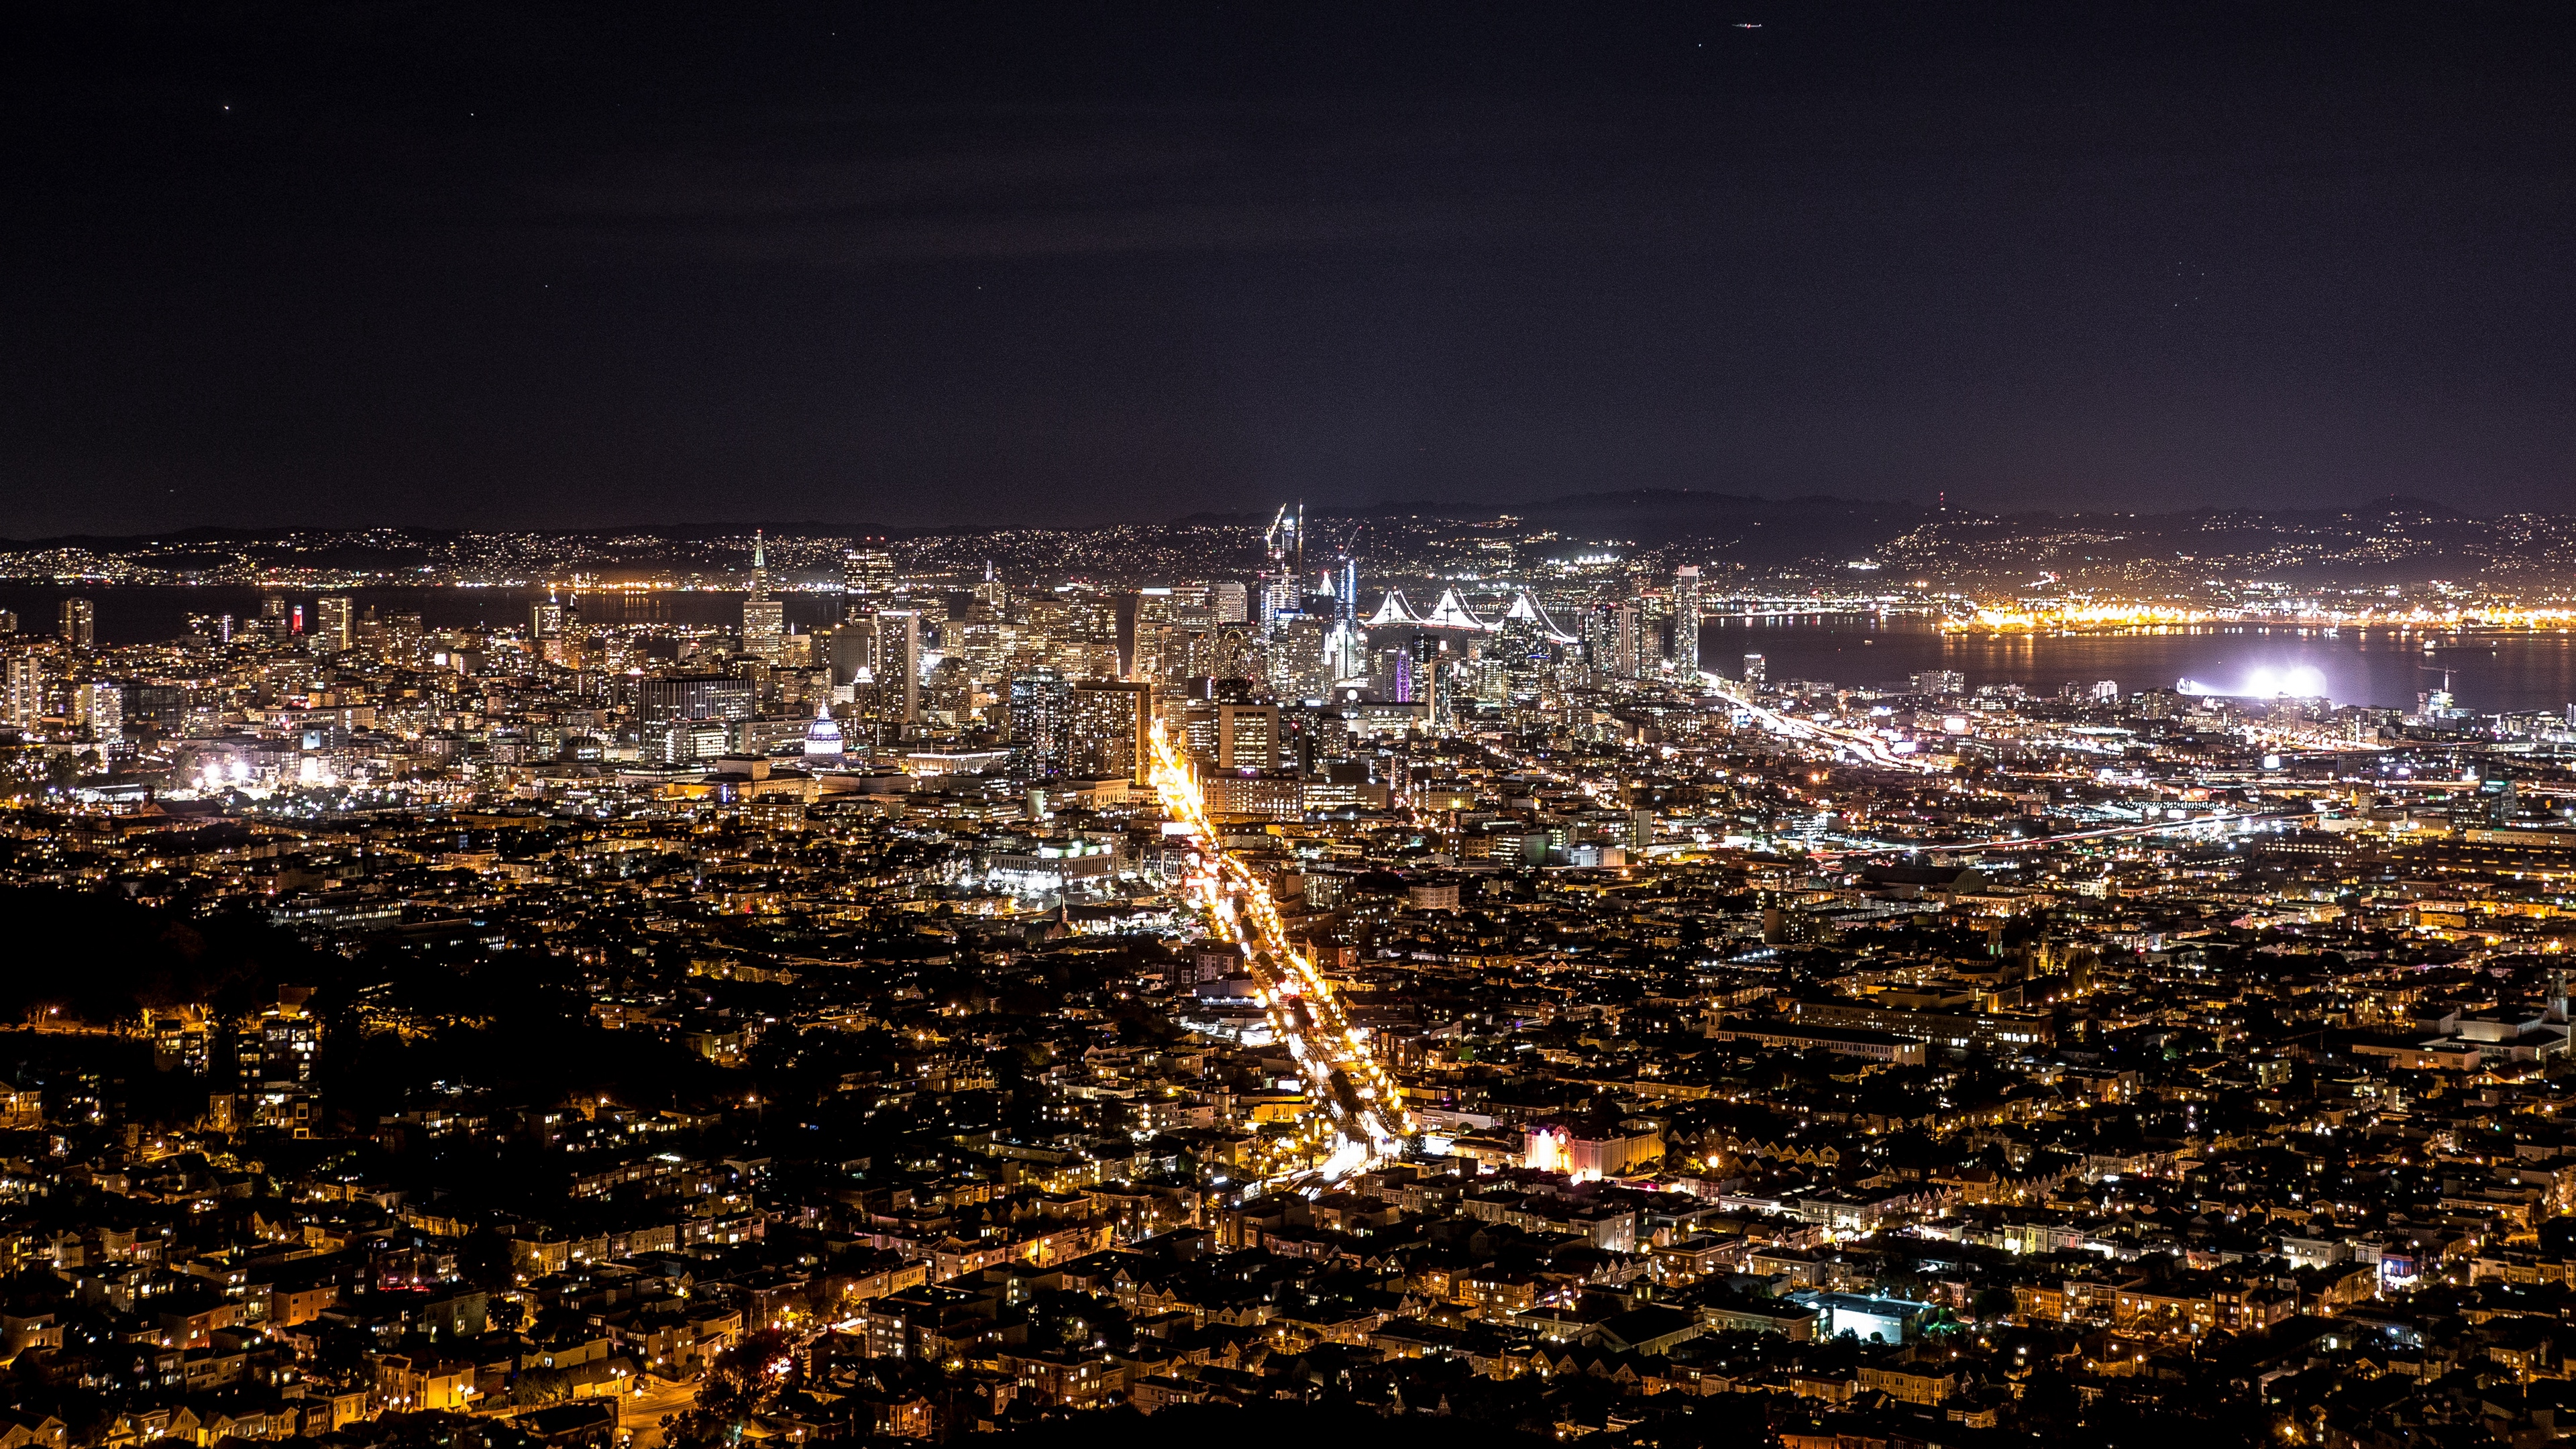 night city top view city lights 4k 1538065655 - night city, top view, city lights 4k - top view, night city, city lights